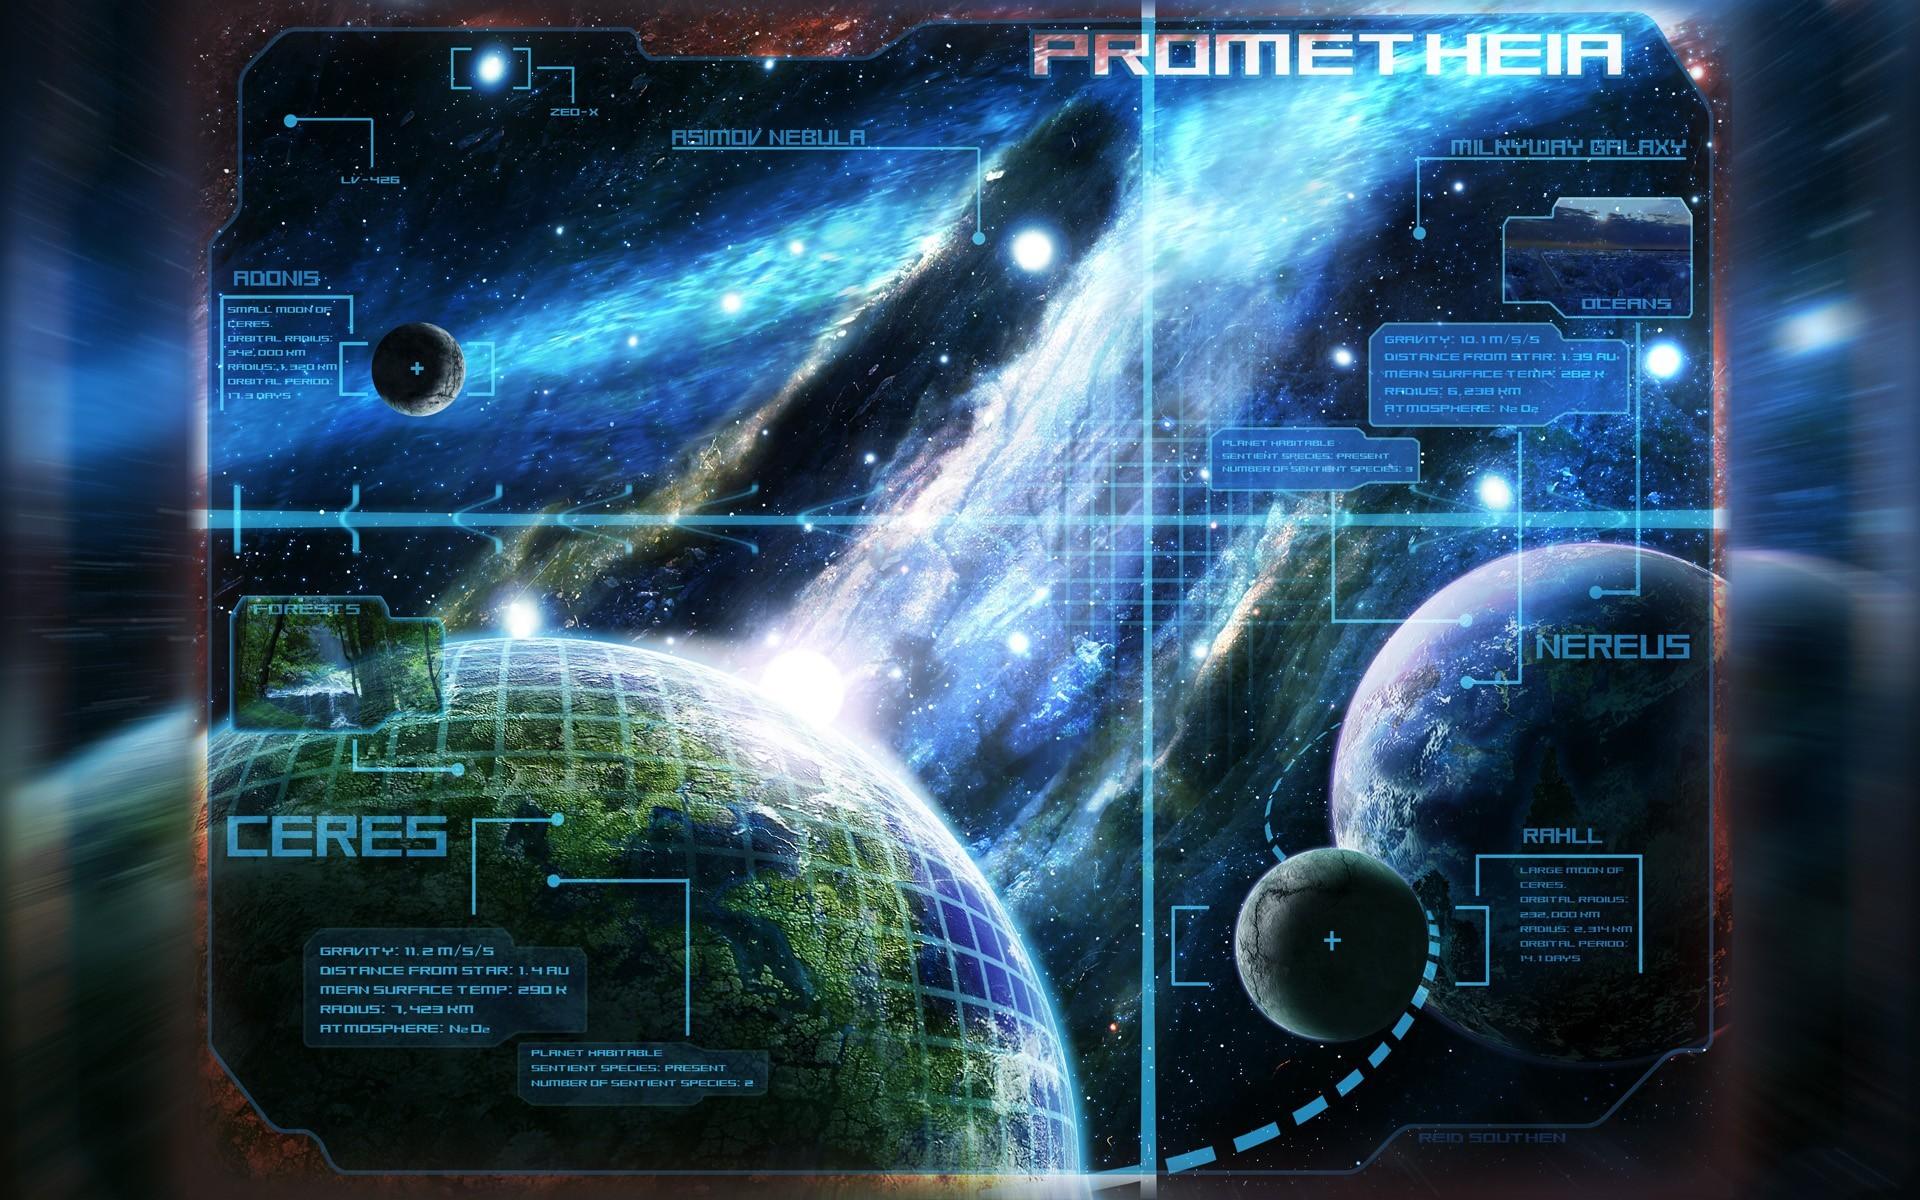 Free mass effect wallpaper background